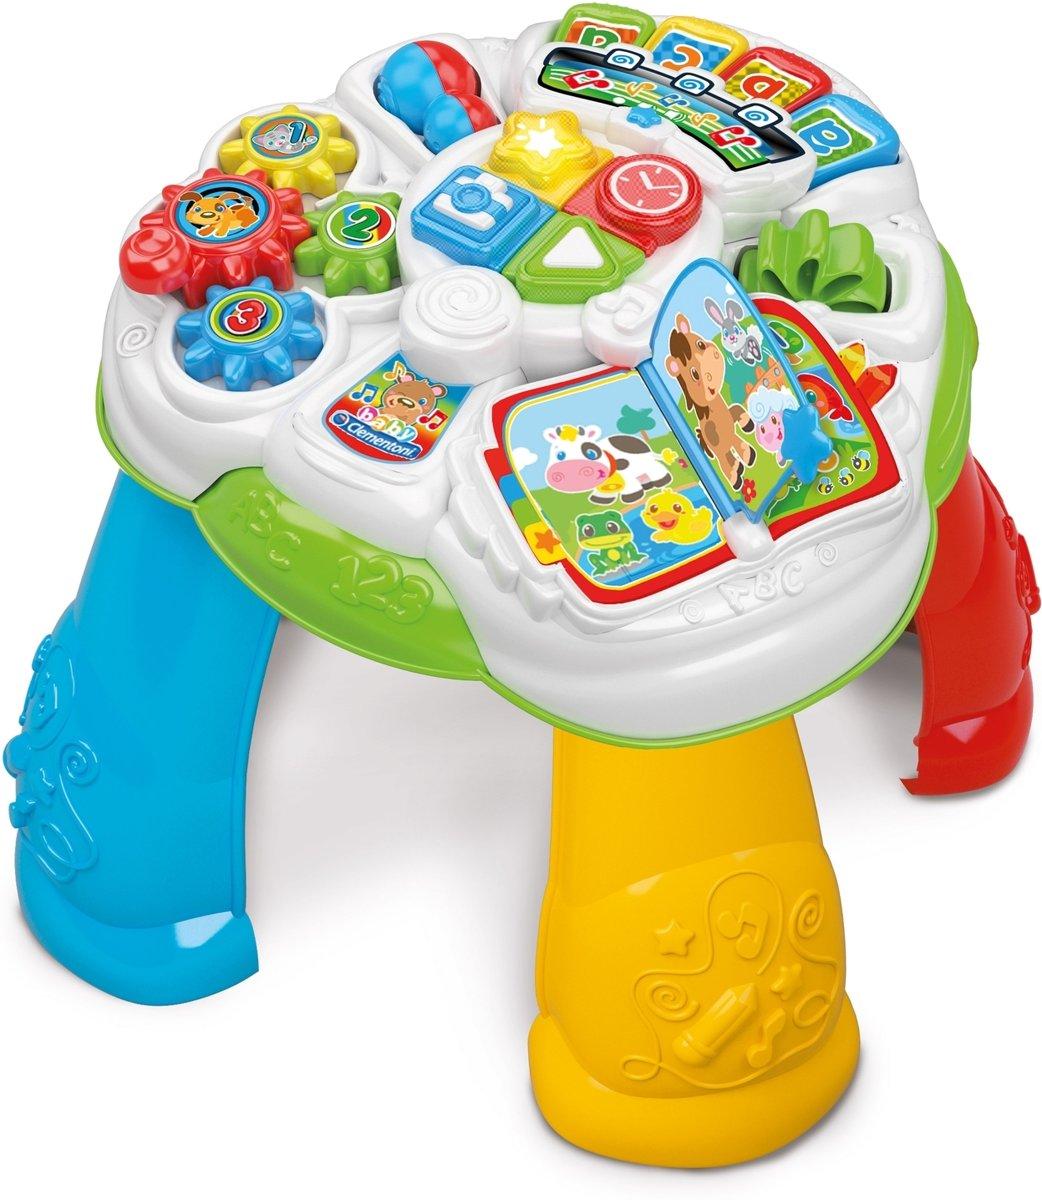 Vossenkop Salon Tafel.Internet Toys Com Speelgoedprijs Nl